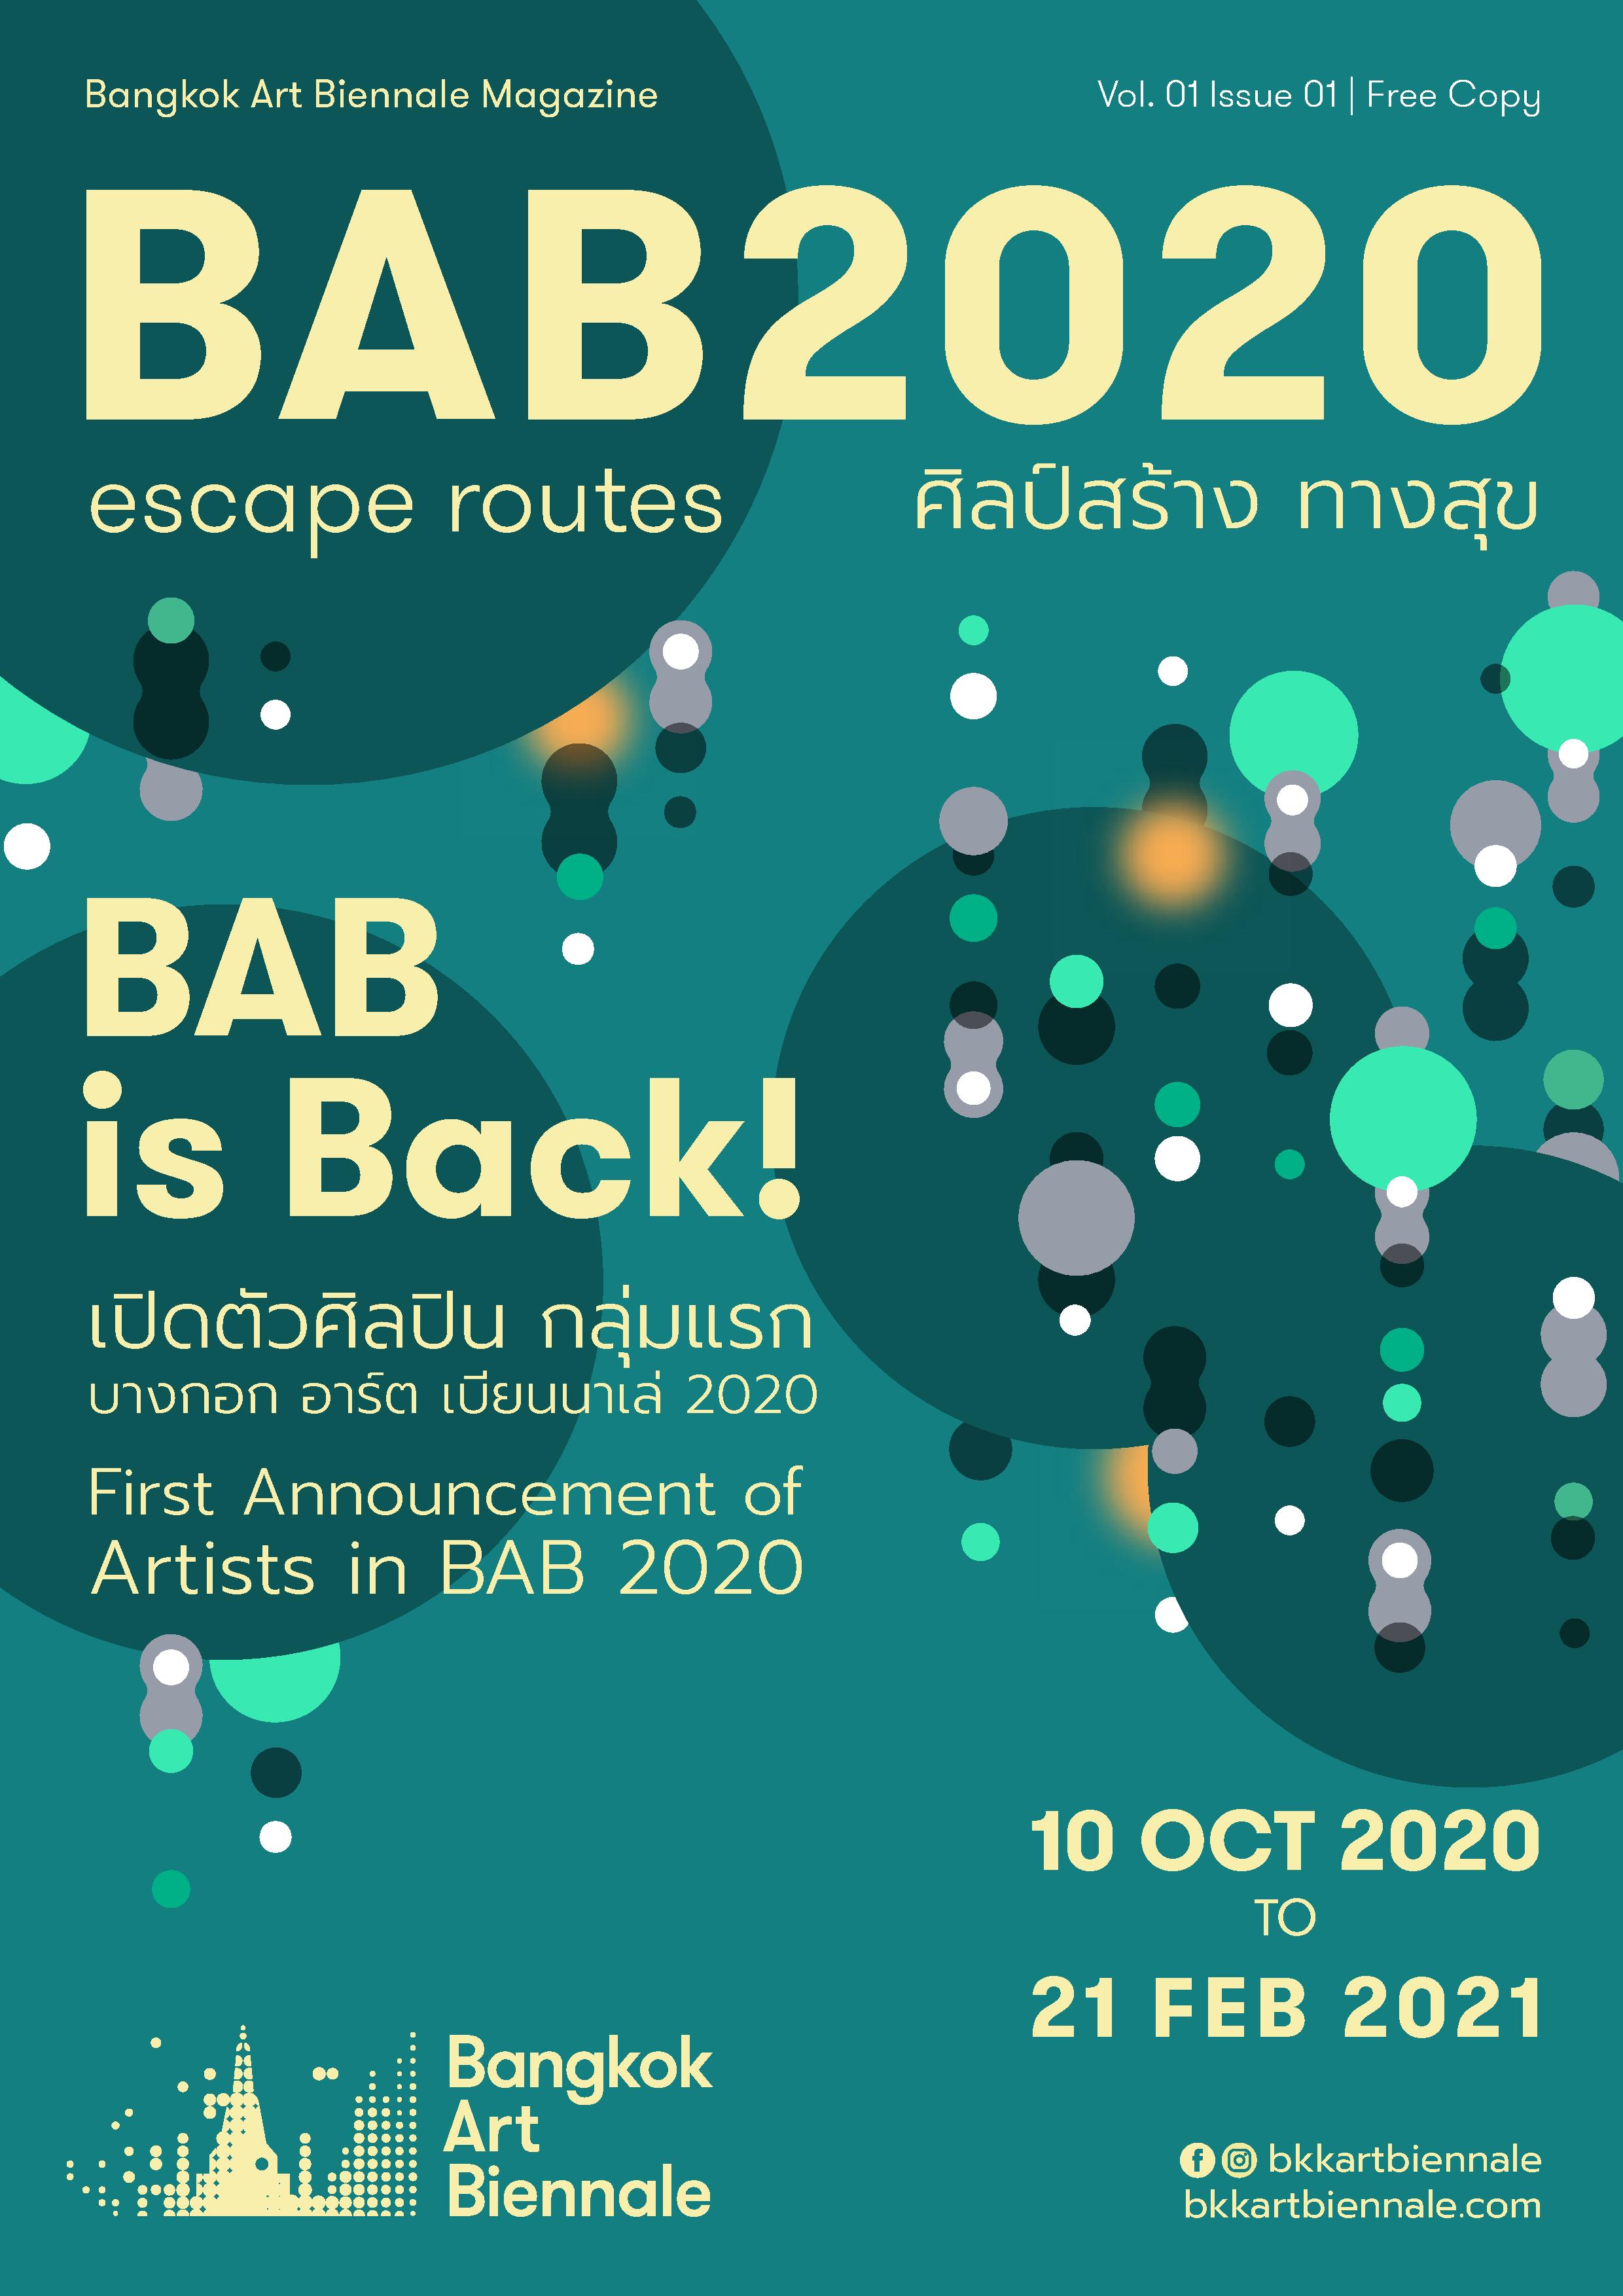 Bangkok Art Biennale Magazine Vol. 01 Issue 01